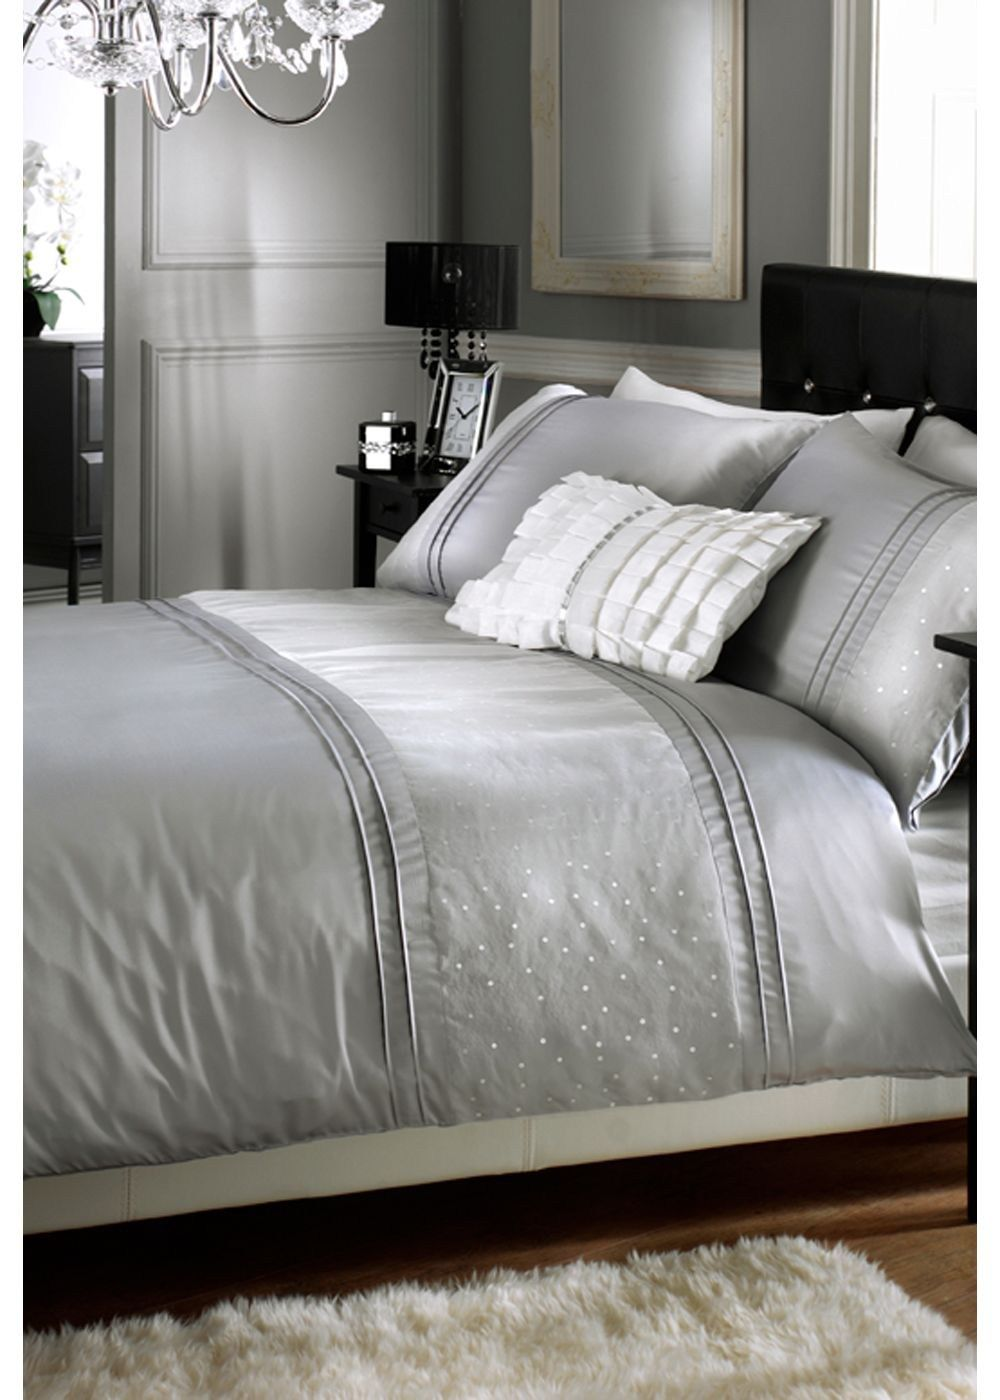 Matalan Duvet Sets DiydaOrg DiydaOrg - Matalan bedroom furniture